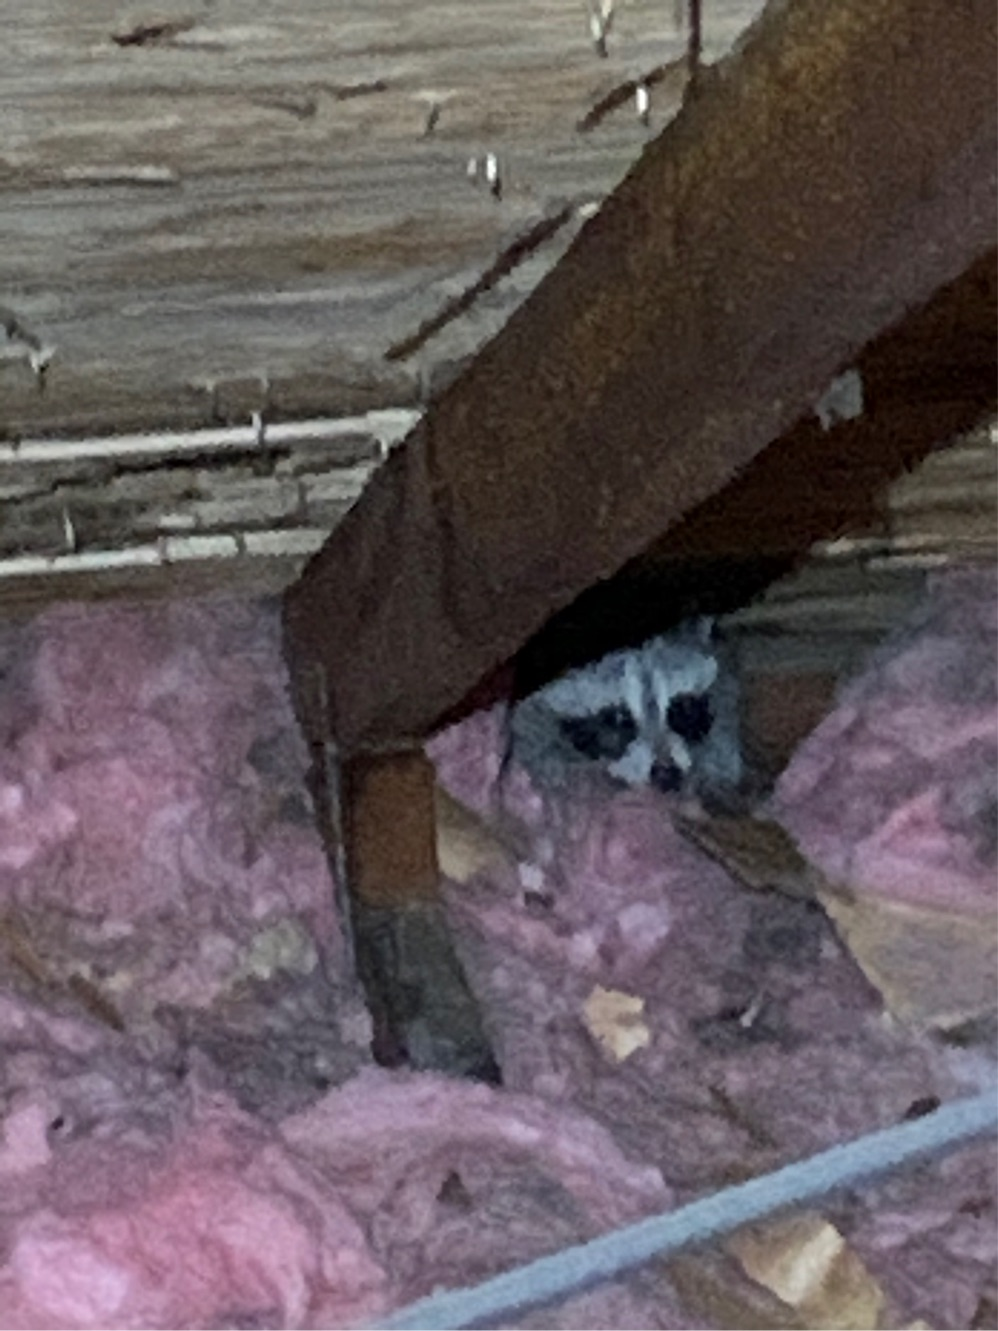 raccoon in house